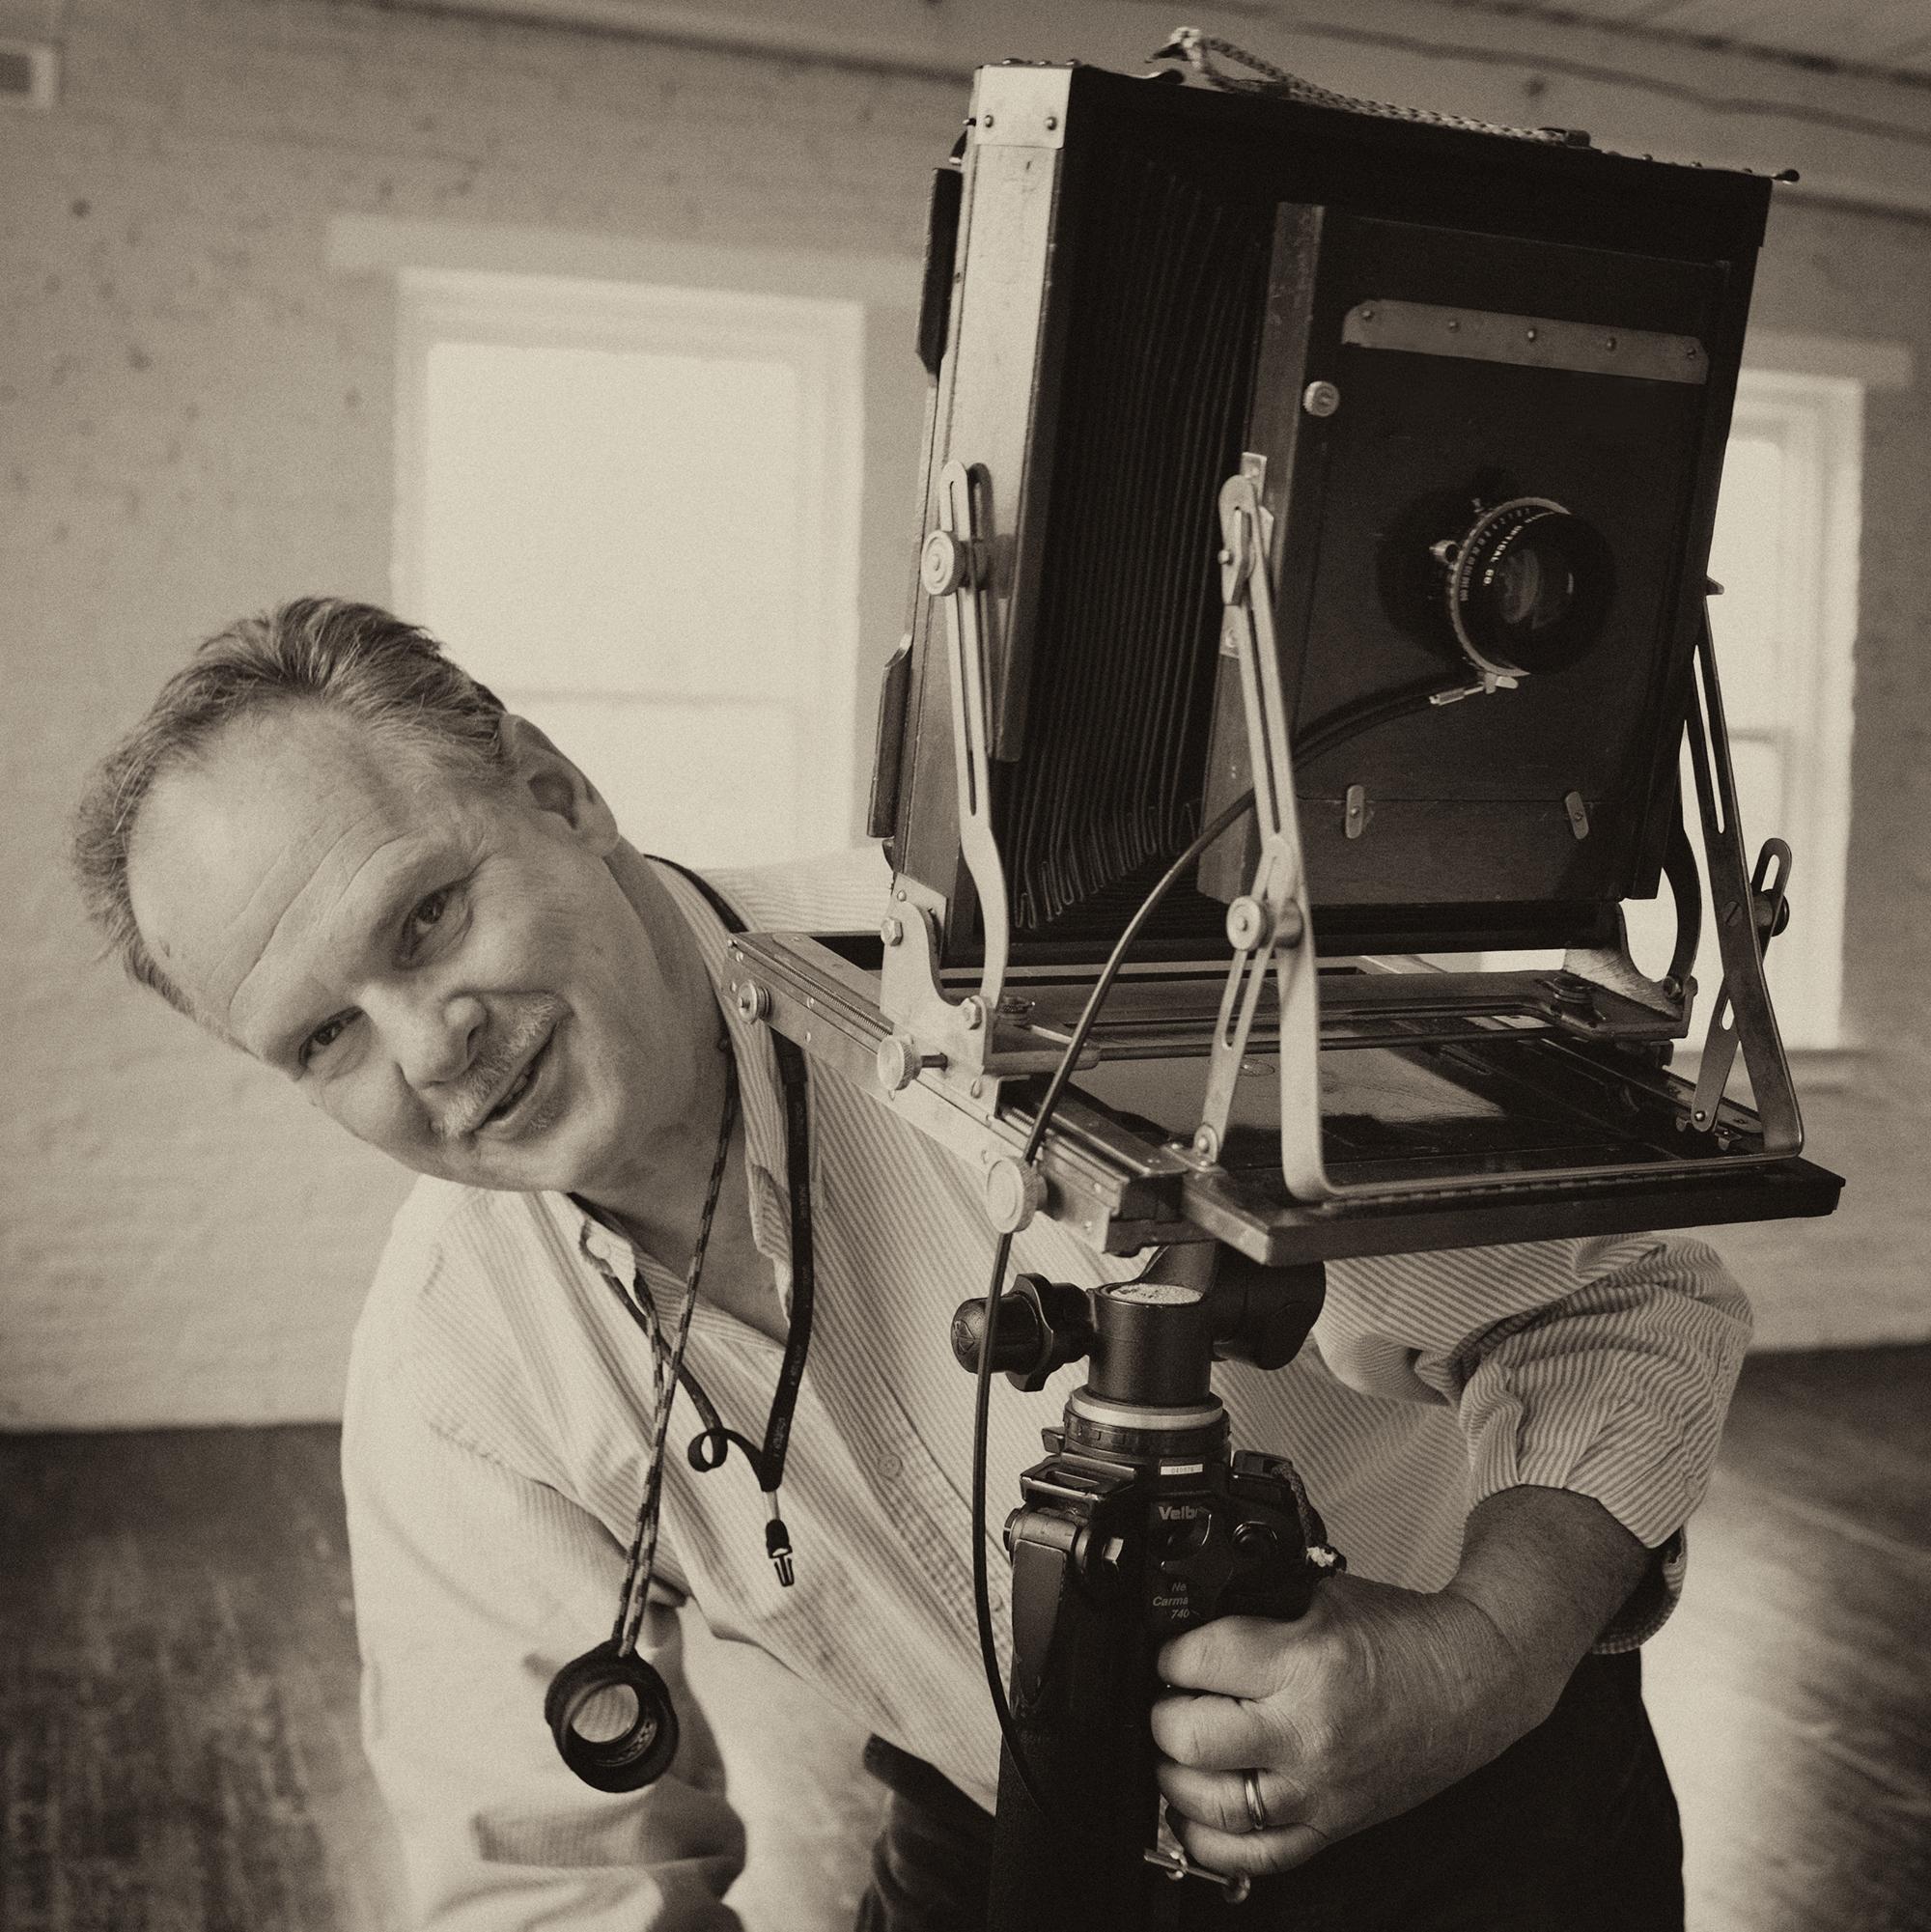 90% of my personal work is still on film. Deardorff 8x10 camera.